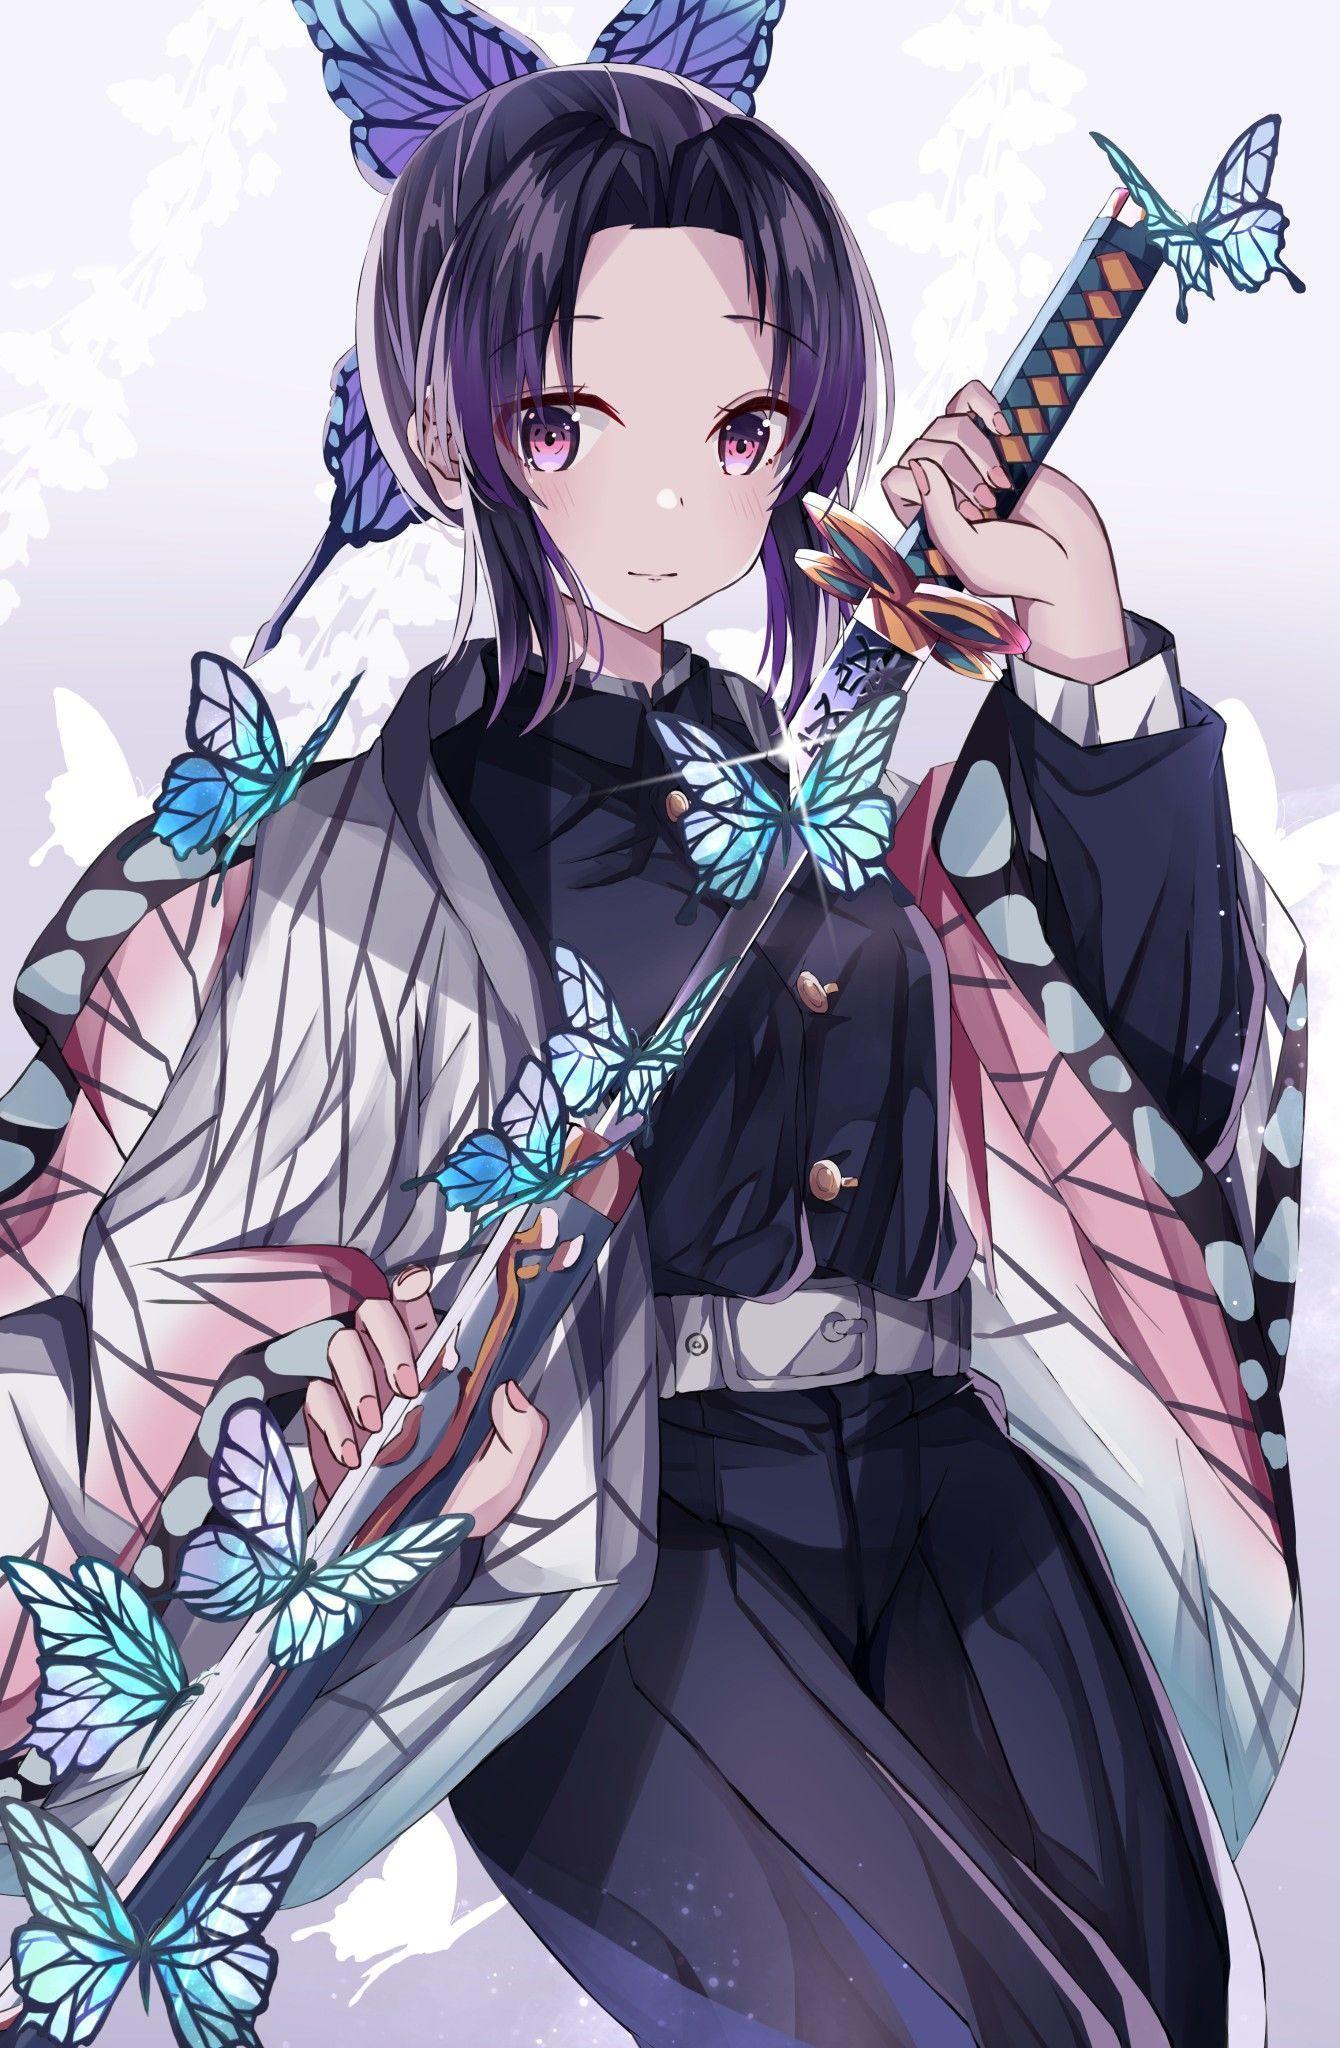 Read Kimetsu No Yaiba / Demon slayer full Manga chapters